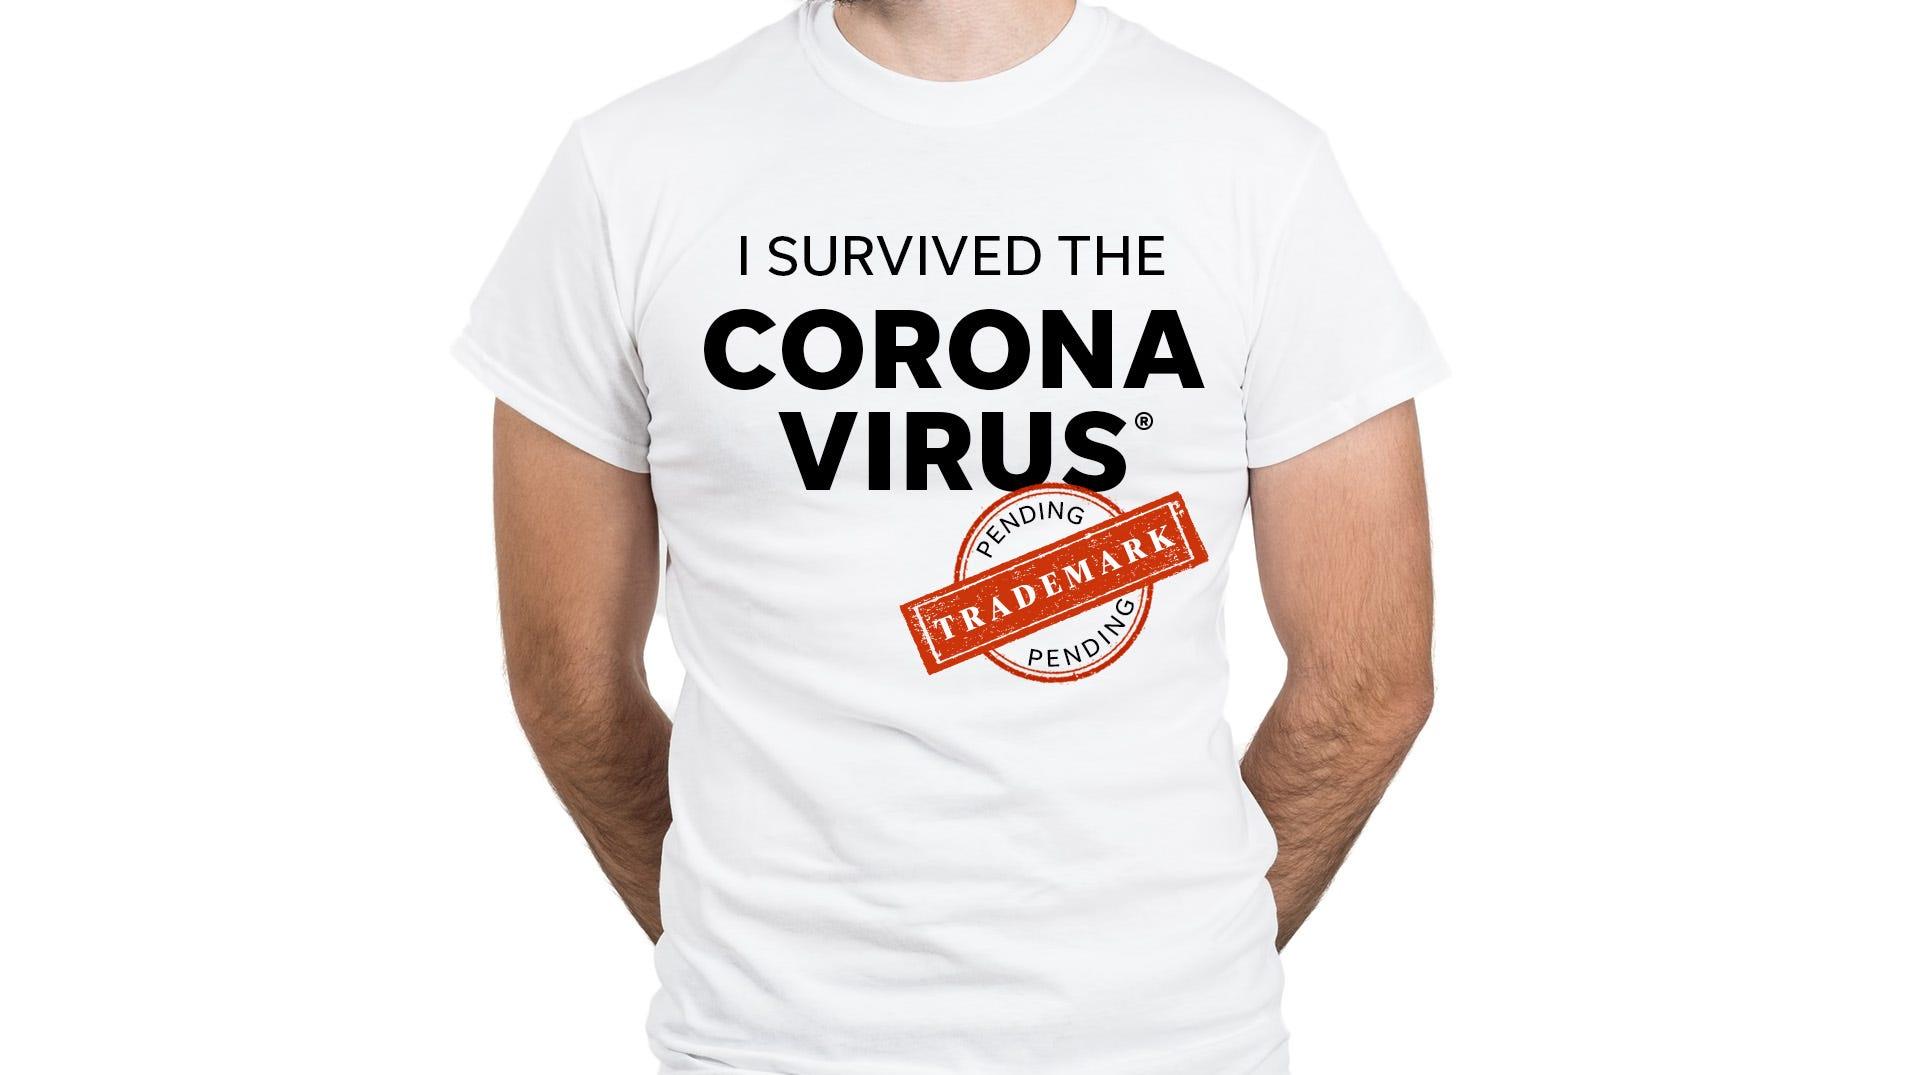 I Survived Nursing School Written Hilarious Designed T-Shirt  2021 Nurse Graduation Shirt  Hilarious Nursing School Graduate Tee